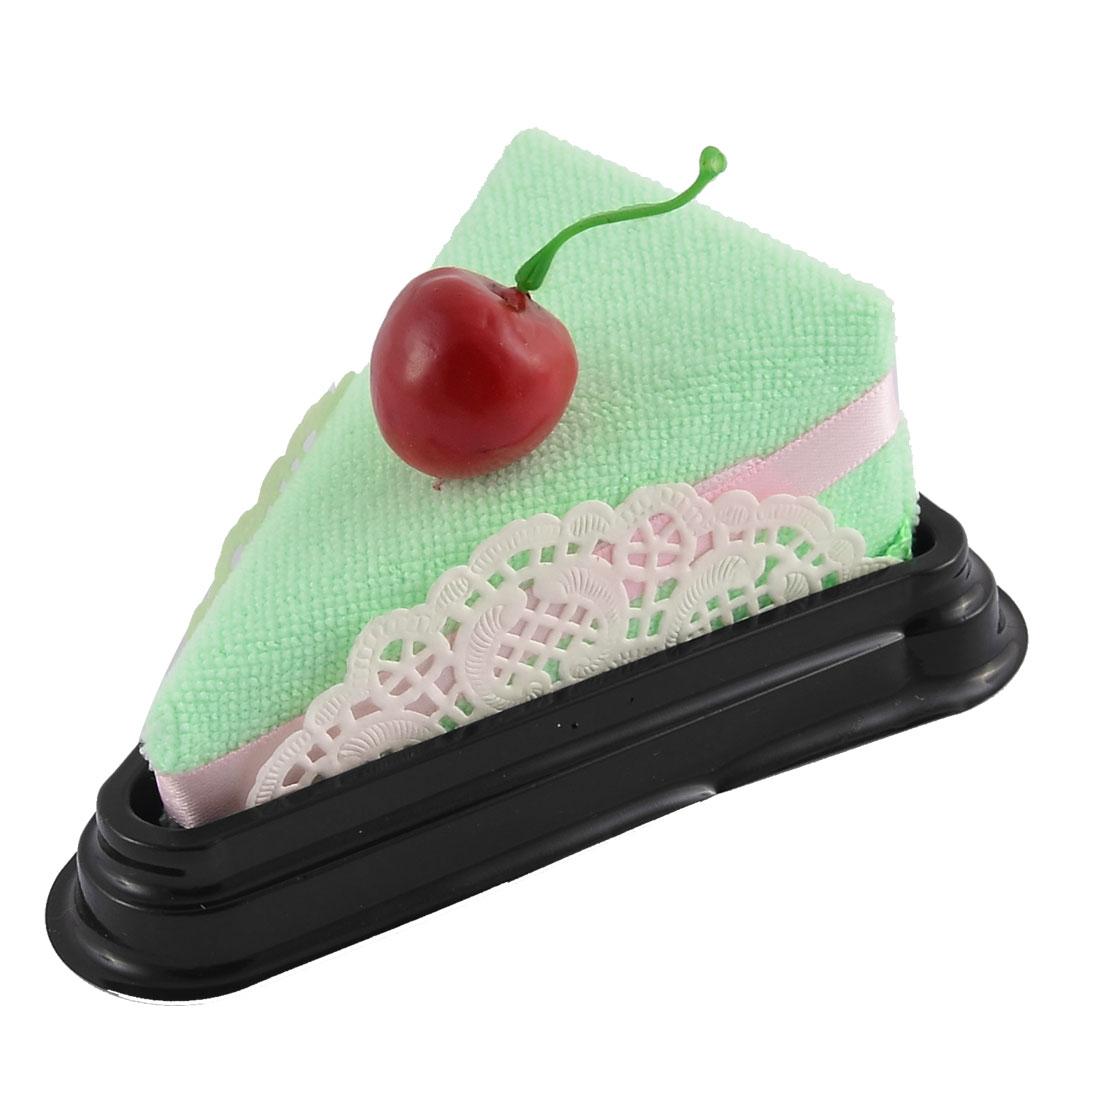 Simulated Cherry Detail Triangular Cake Sandwich Towel Washcloth Decor Gift Green